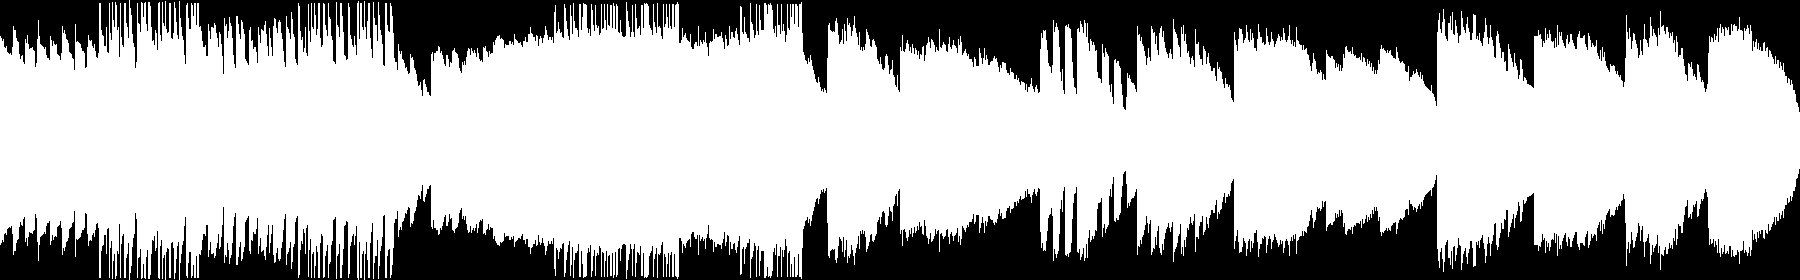 Starboi audio waveform